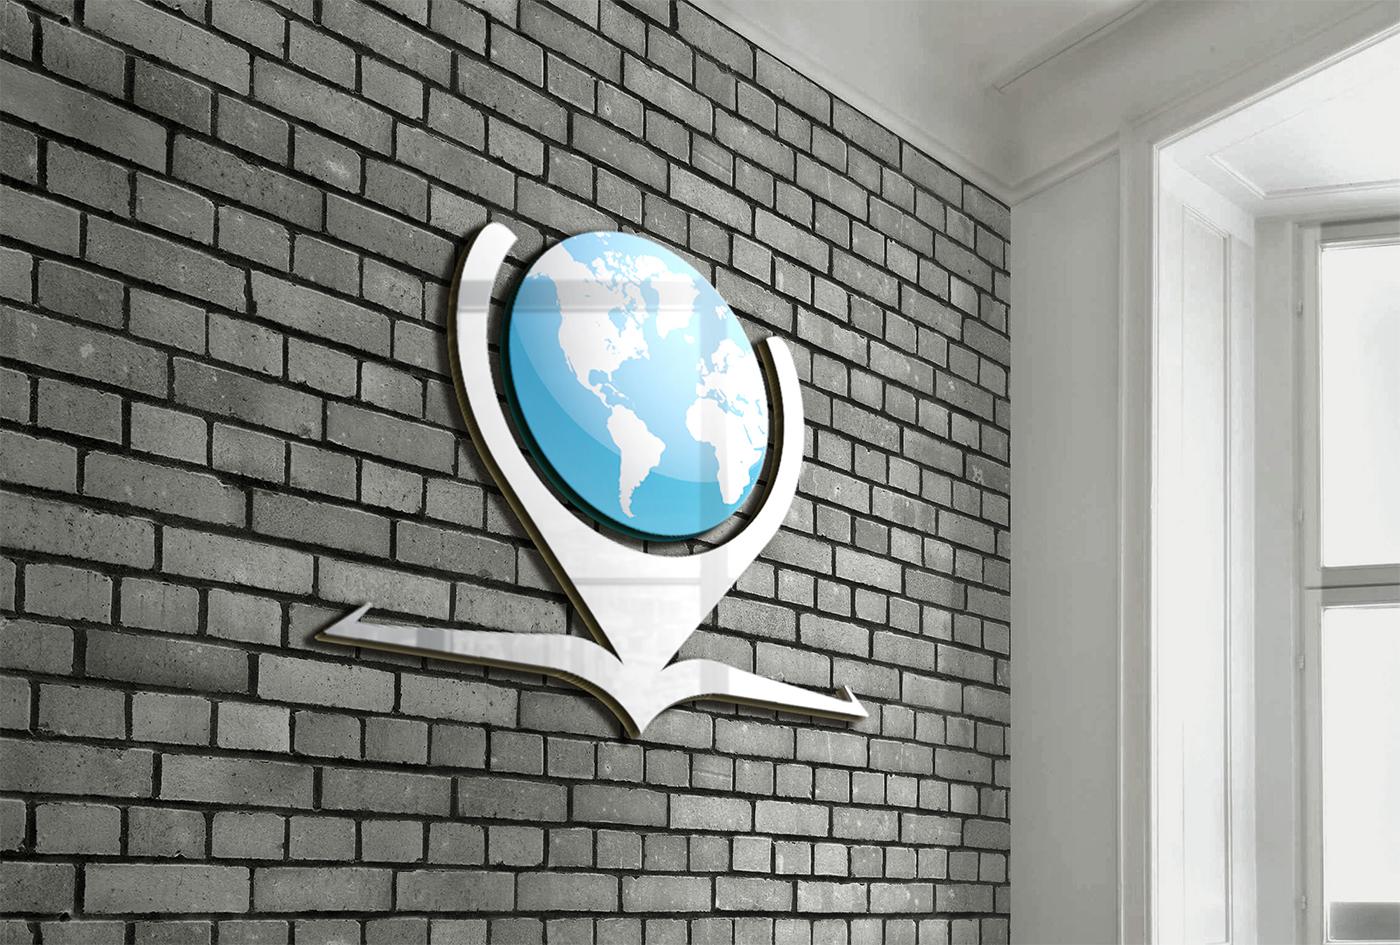 The World Book Icon